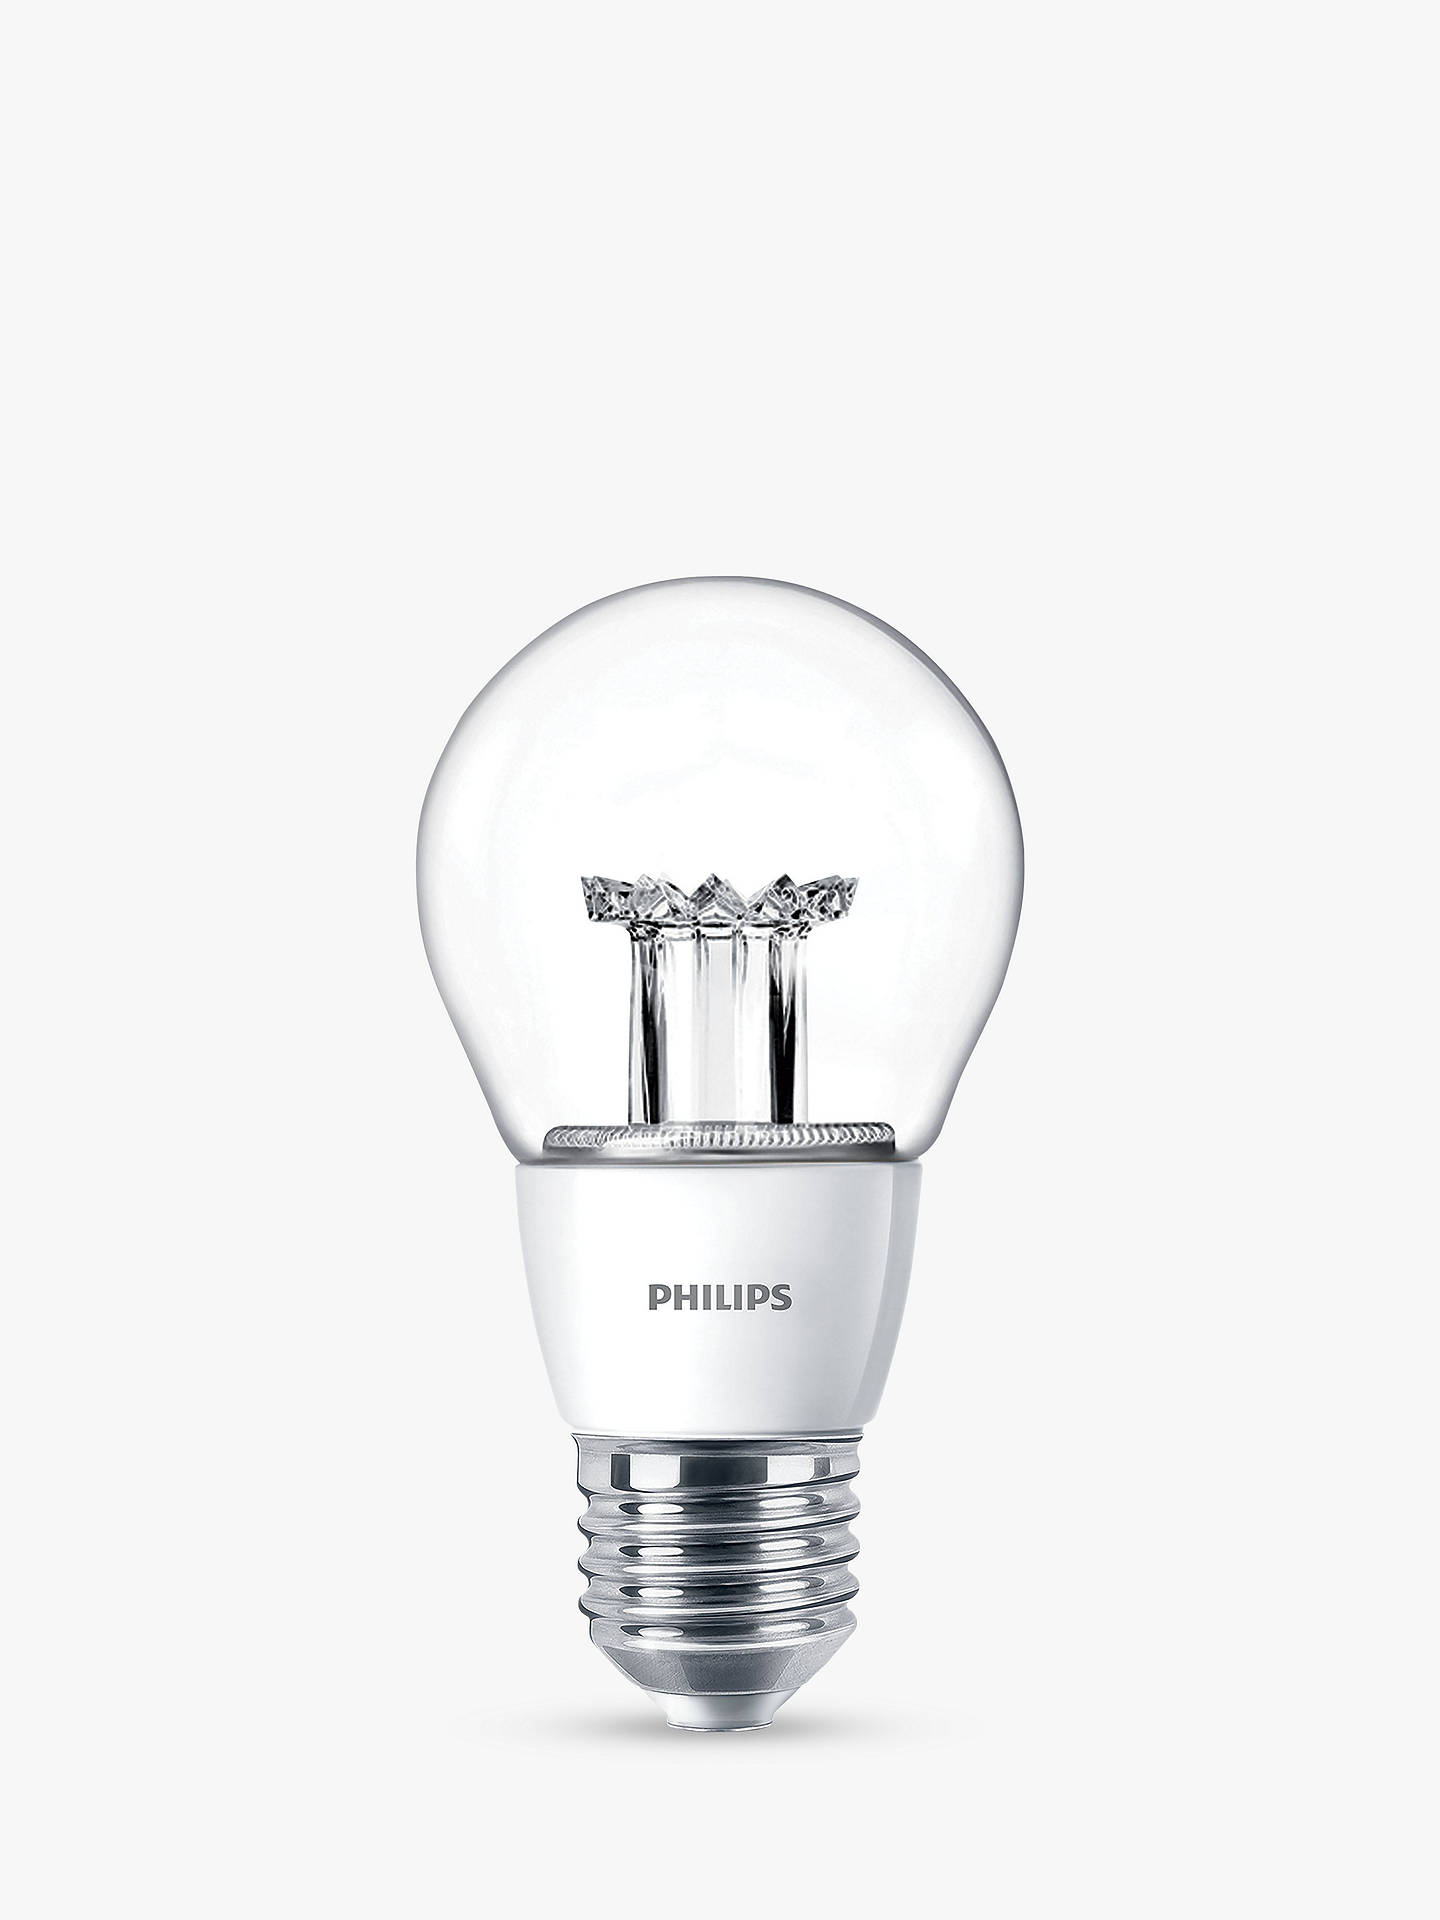 3 X NEW 30/% ENERGY SAVING 18W = 25W DIMMABLE CANDLE HALOGEN LIGHT BULBS SBC B15